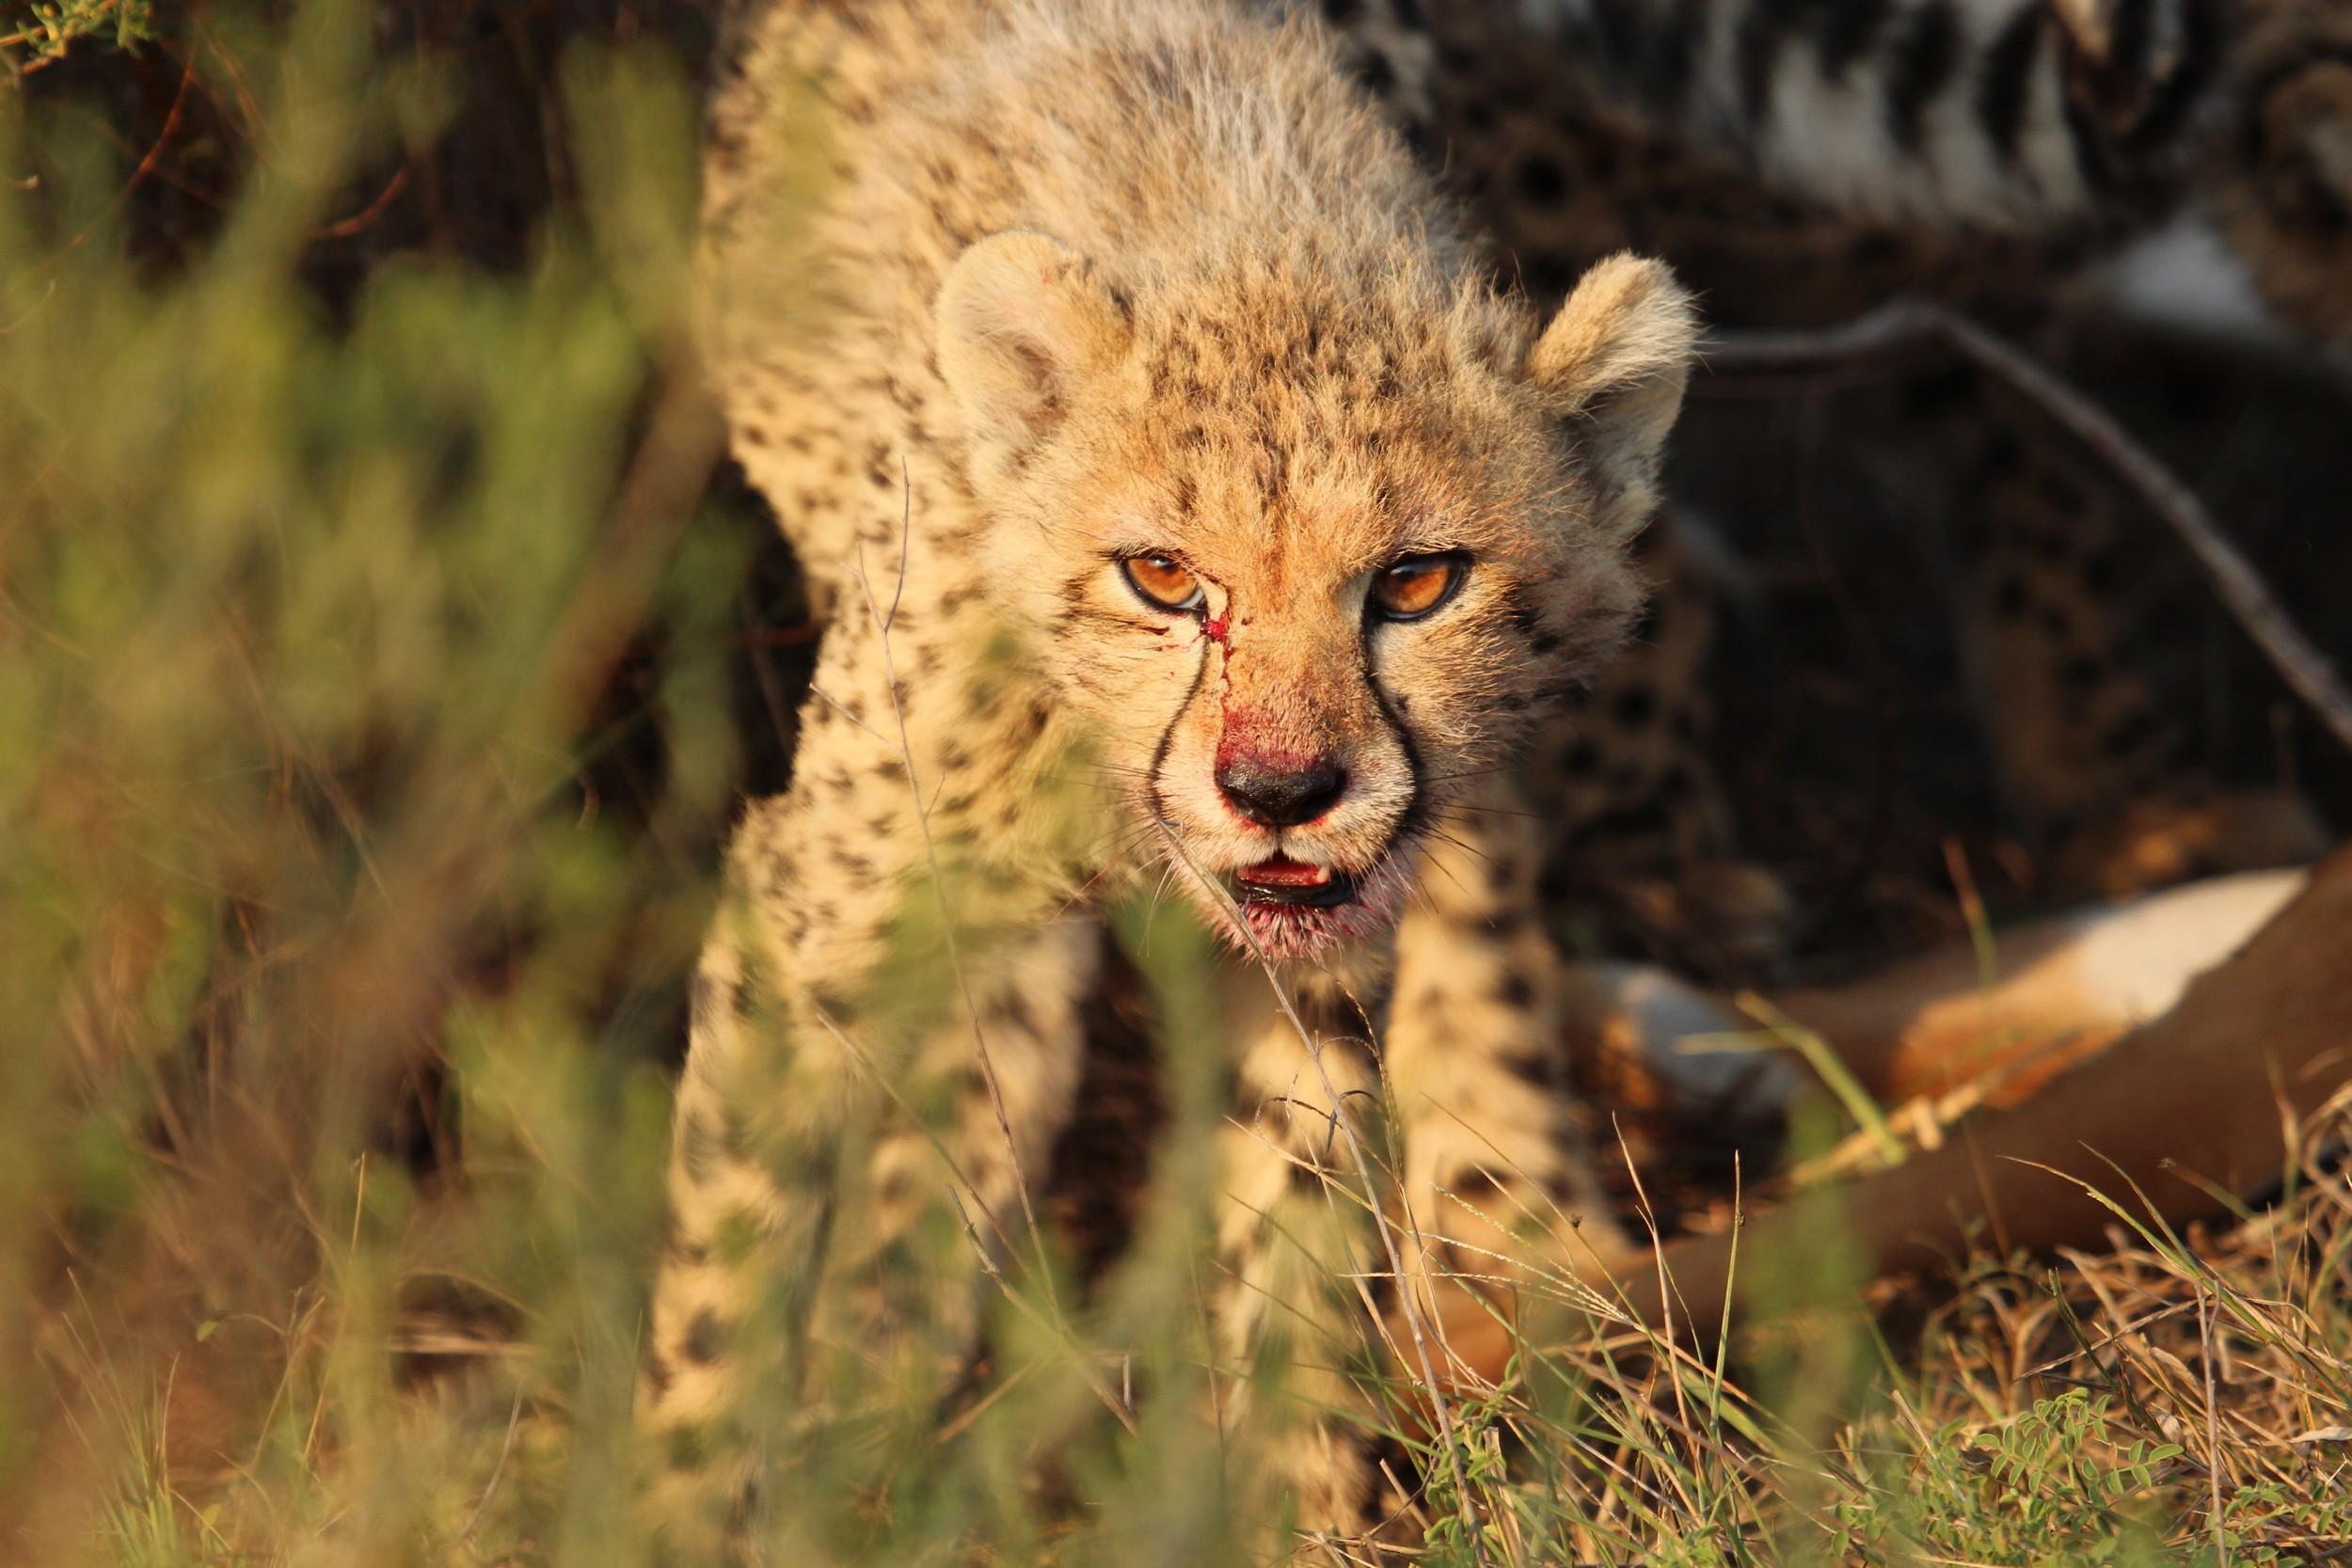 feeding baby cheetah